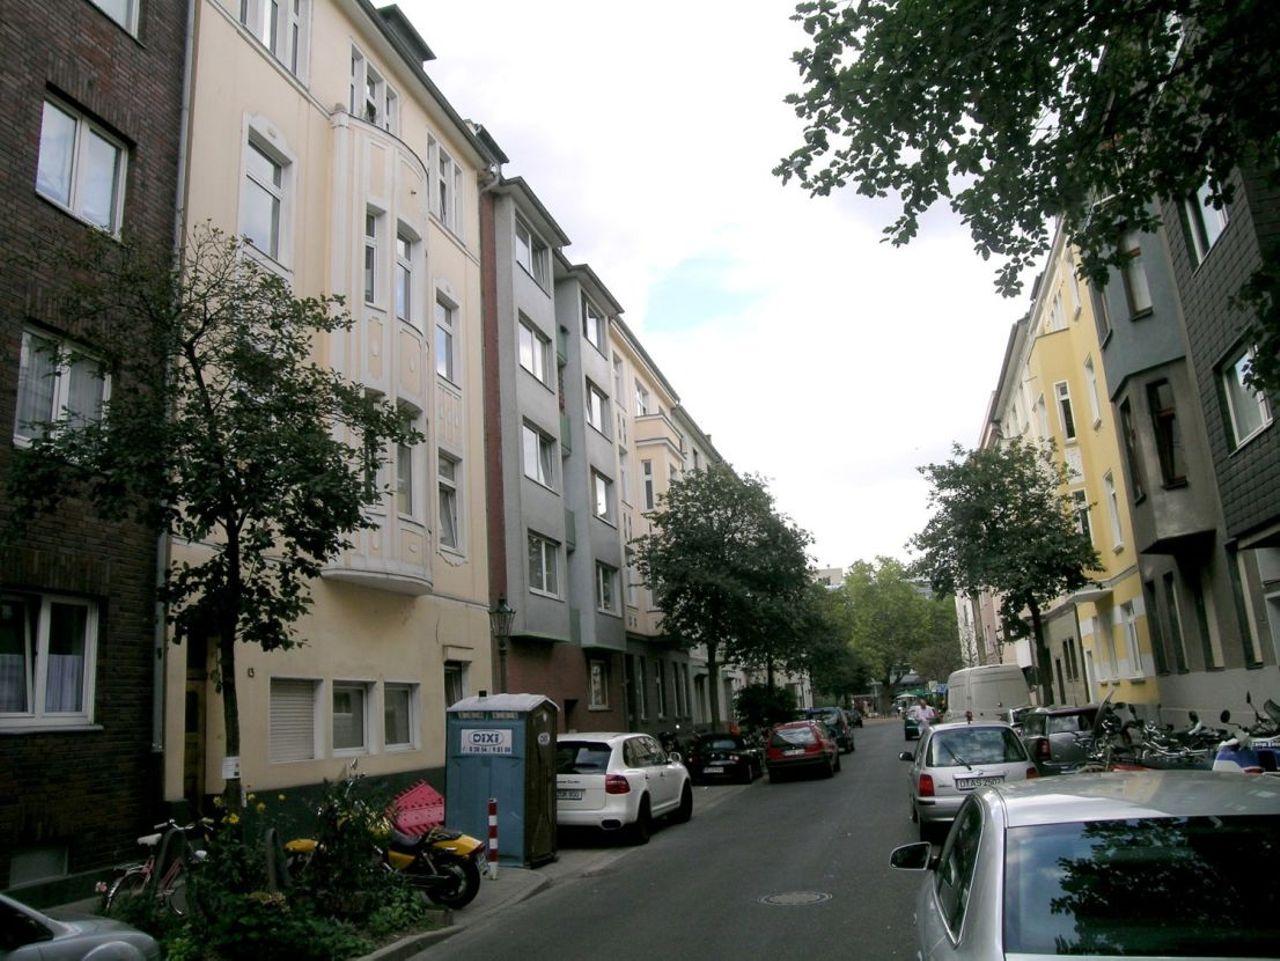 Neckarstraße